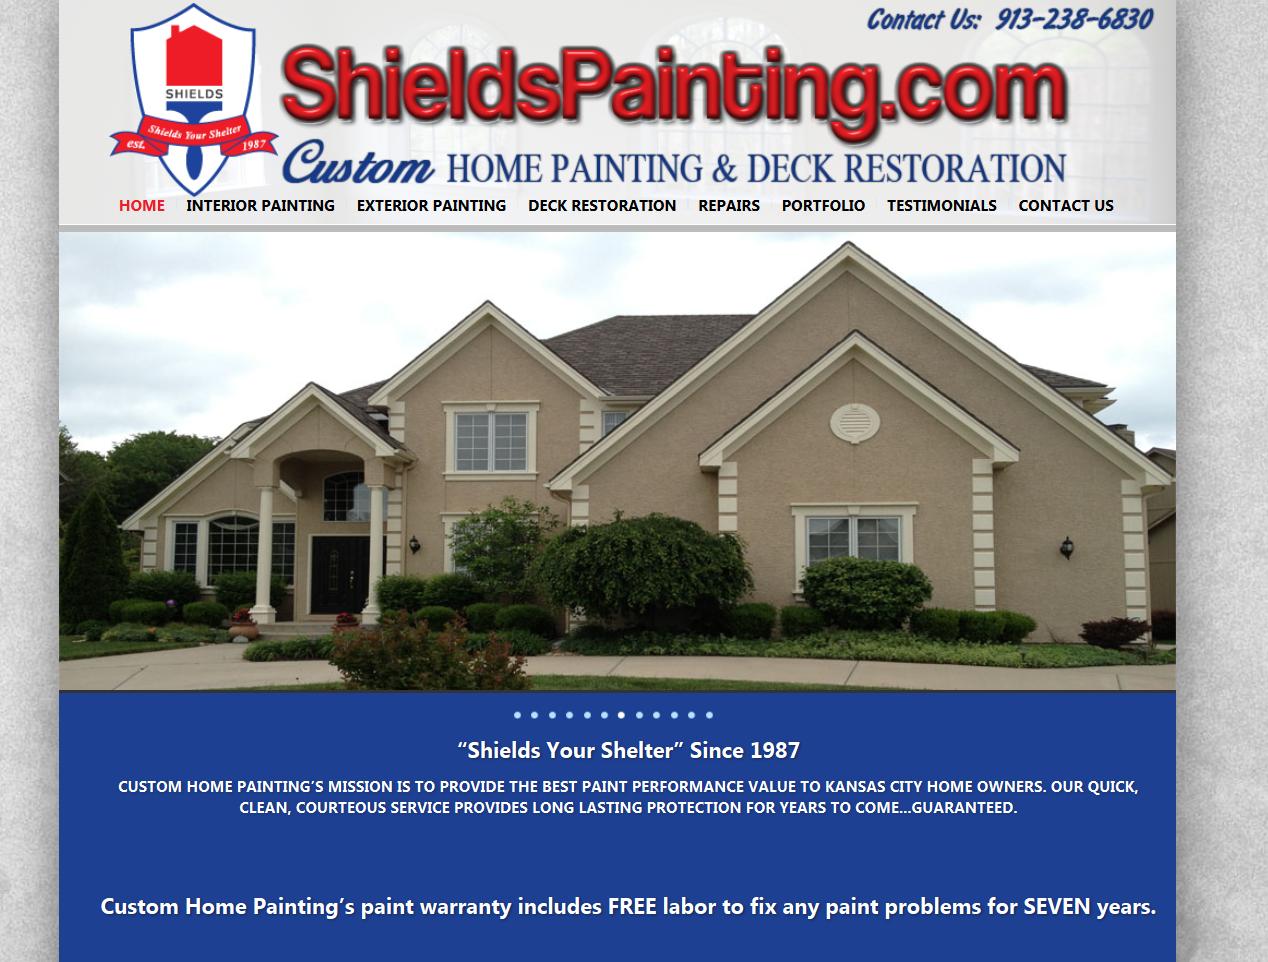 Shields Painting http://shieldspainting.com/site/